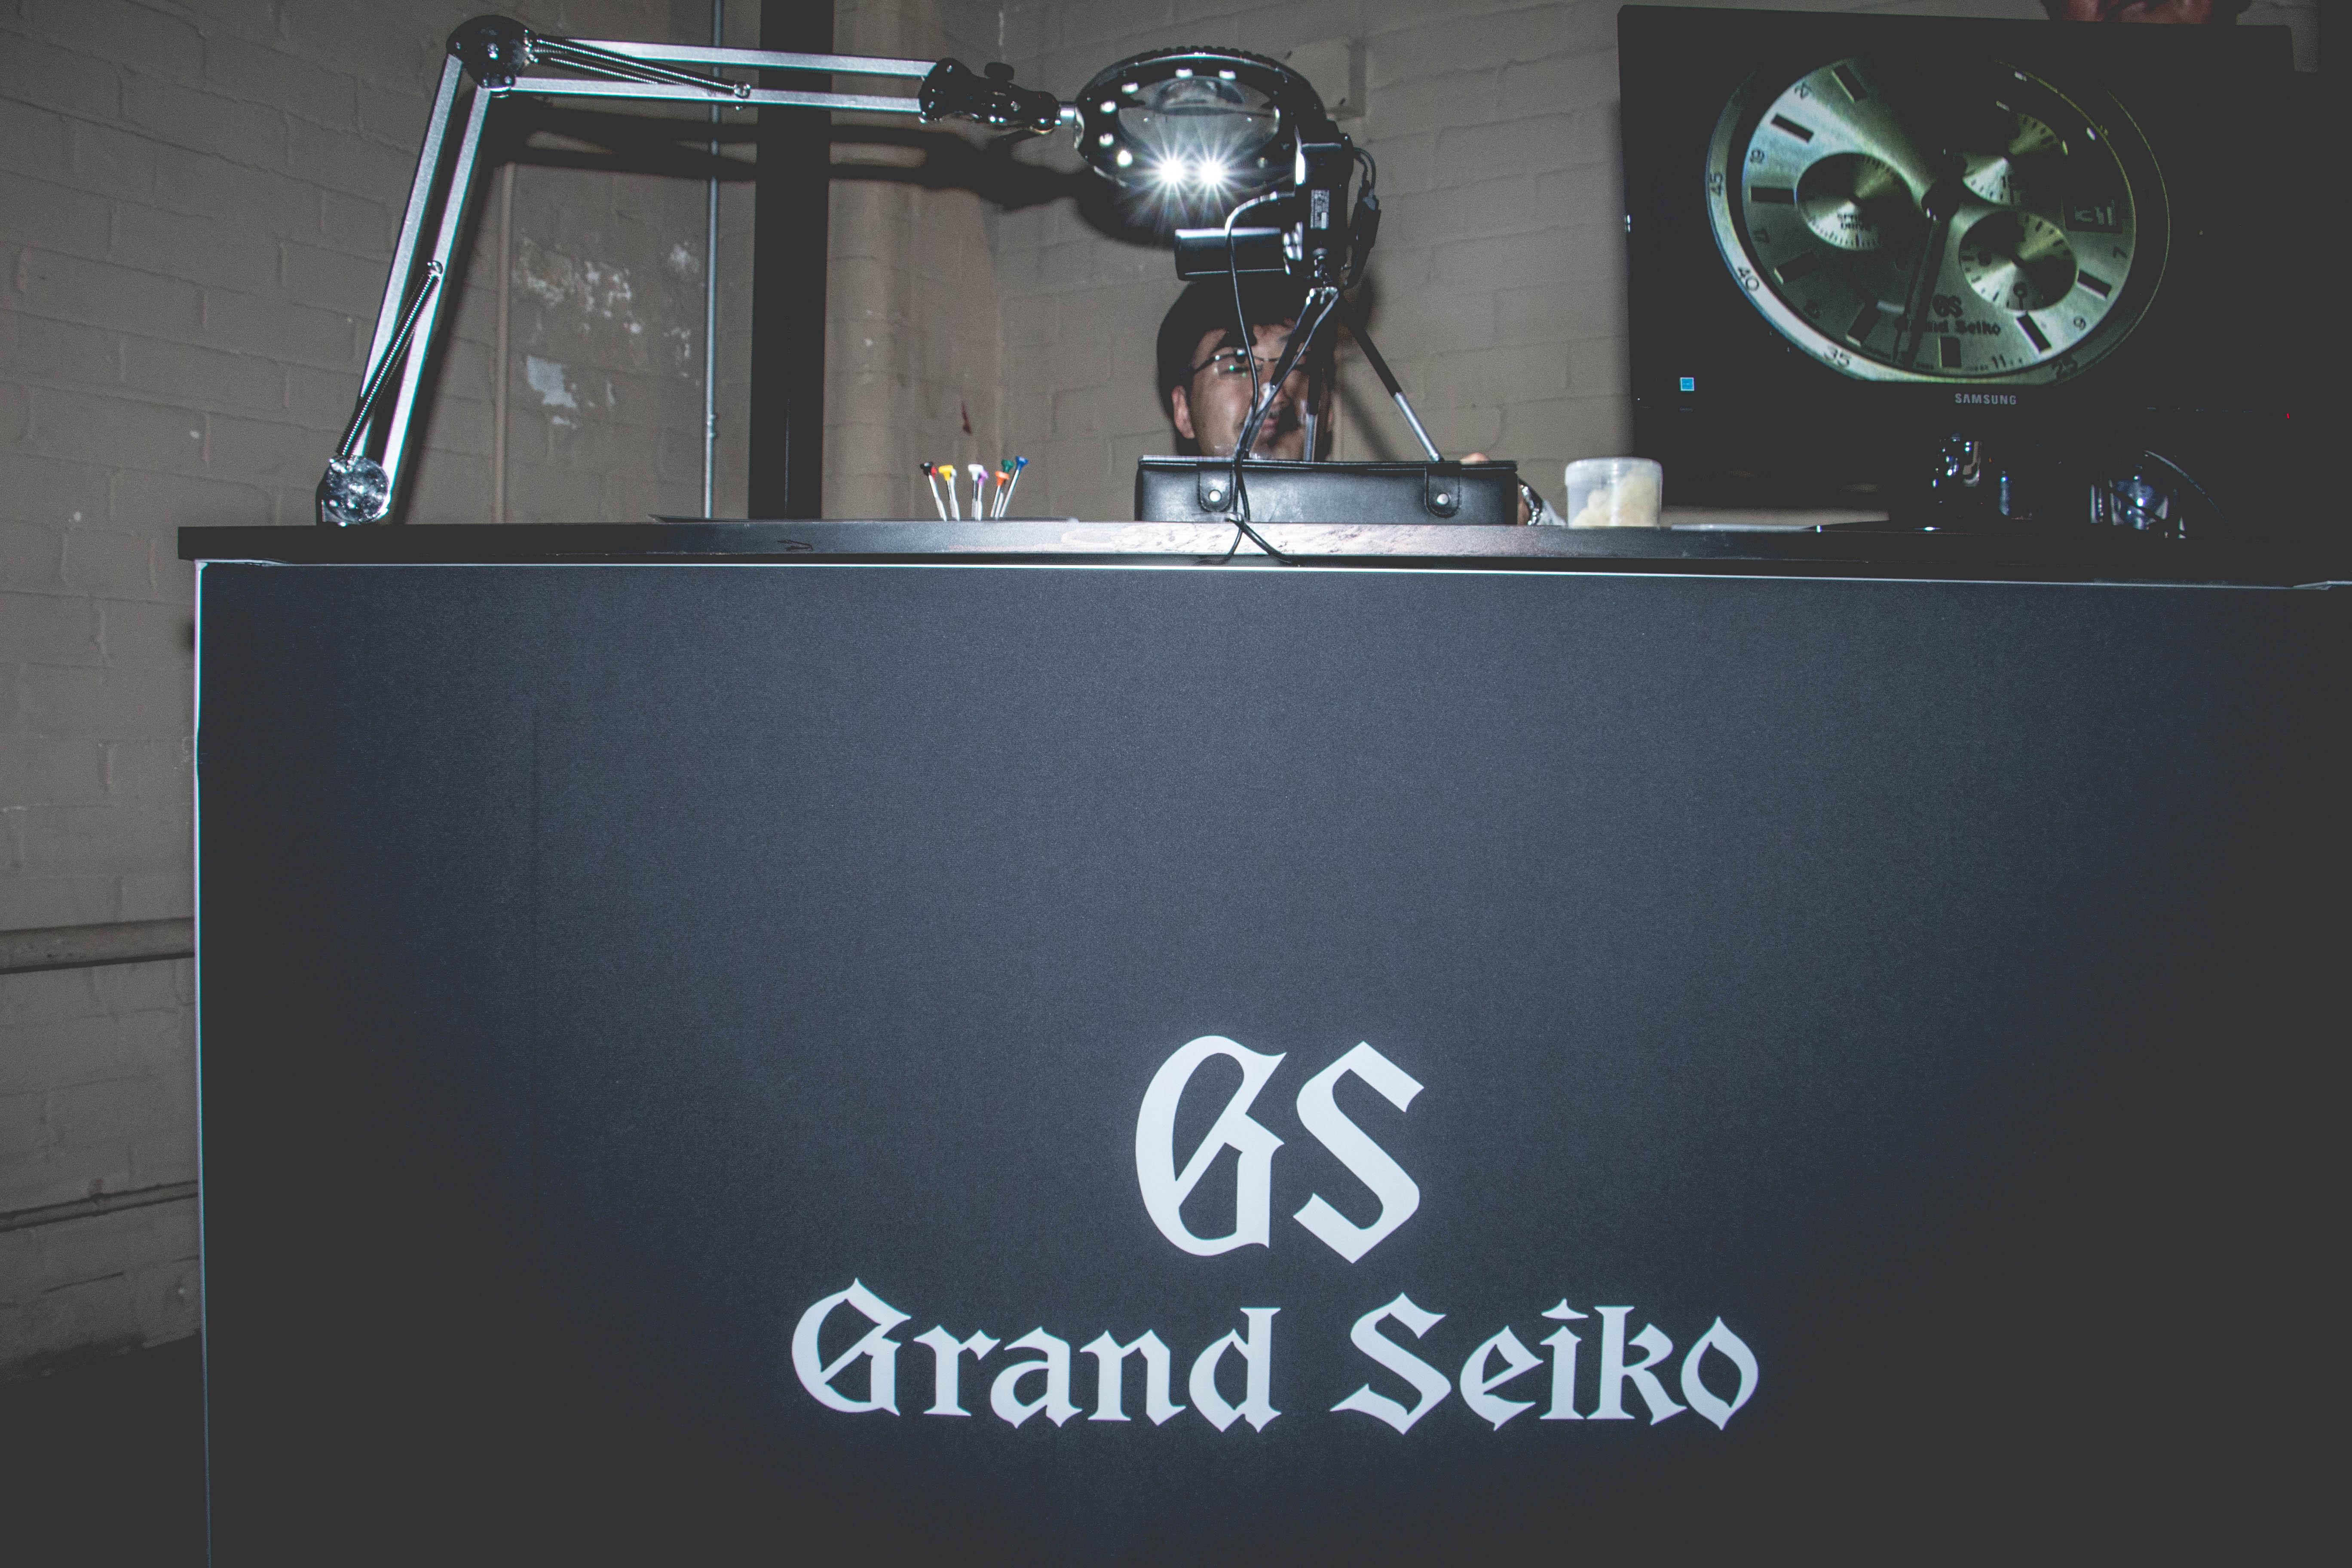 SEIKO Presents Grand SEIKO Watch Collection